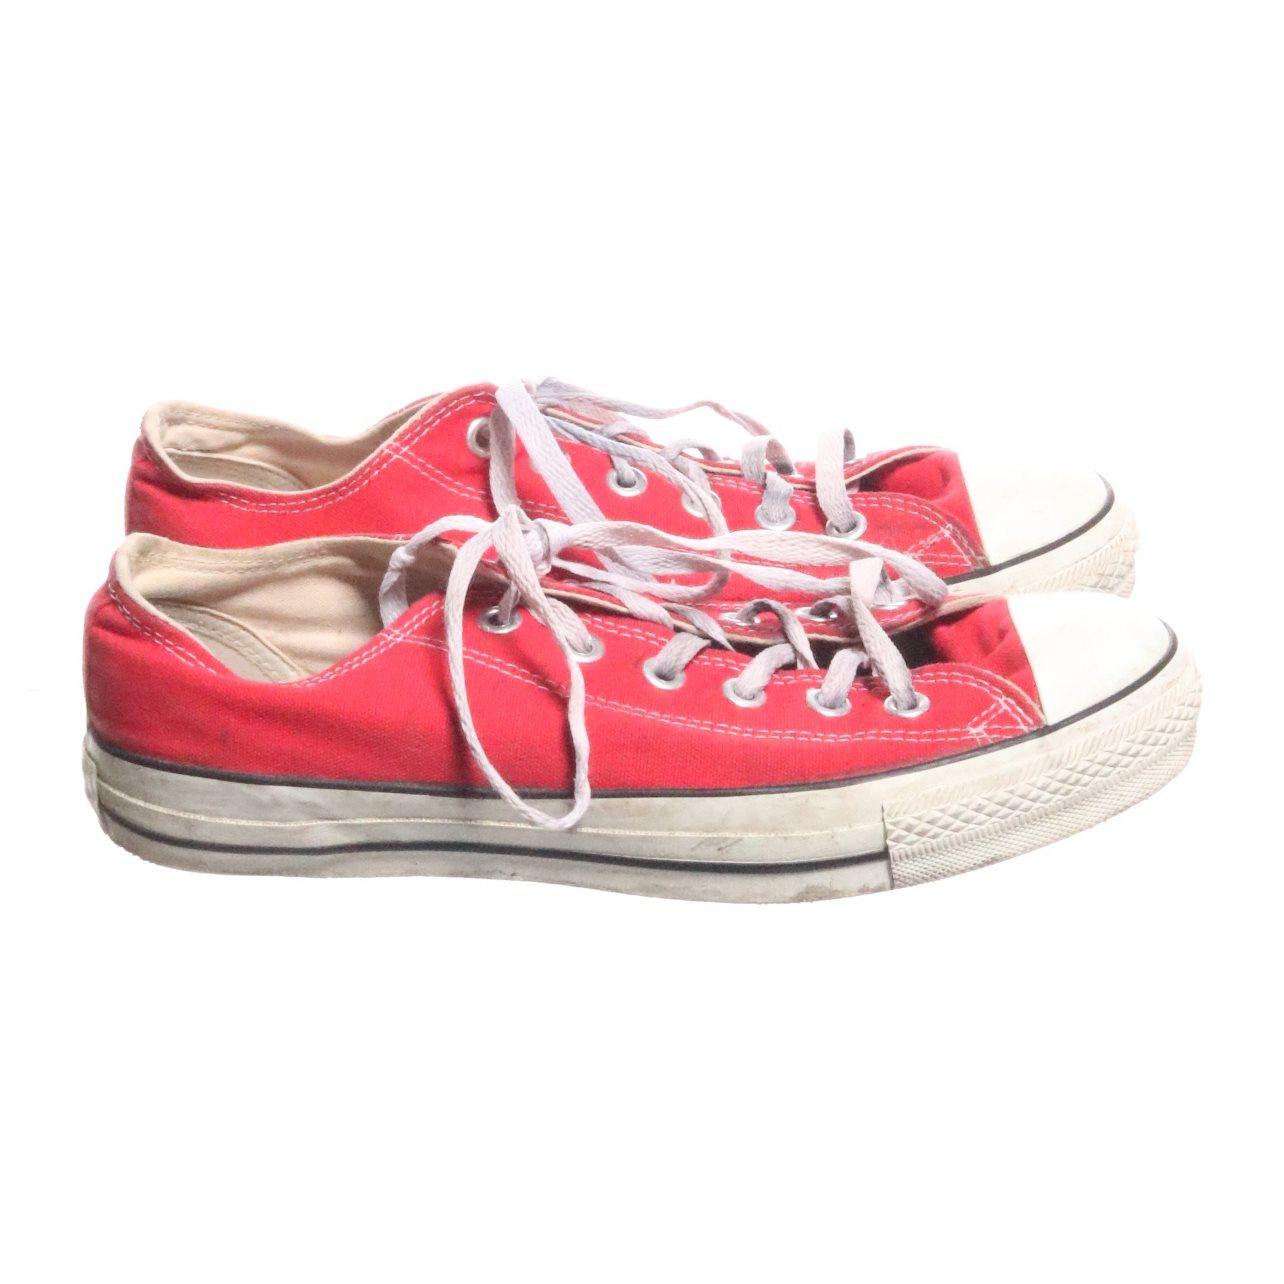 714ecb9b132 Converse, Sneakers, Strl: 41, ALL STAR, Röd (334074331) ᐈ Sellpy på ...